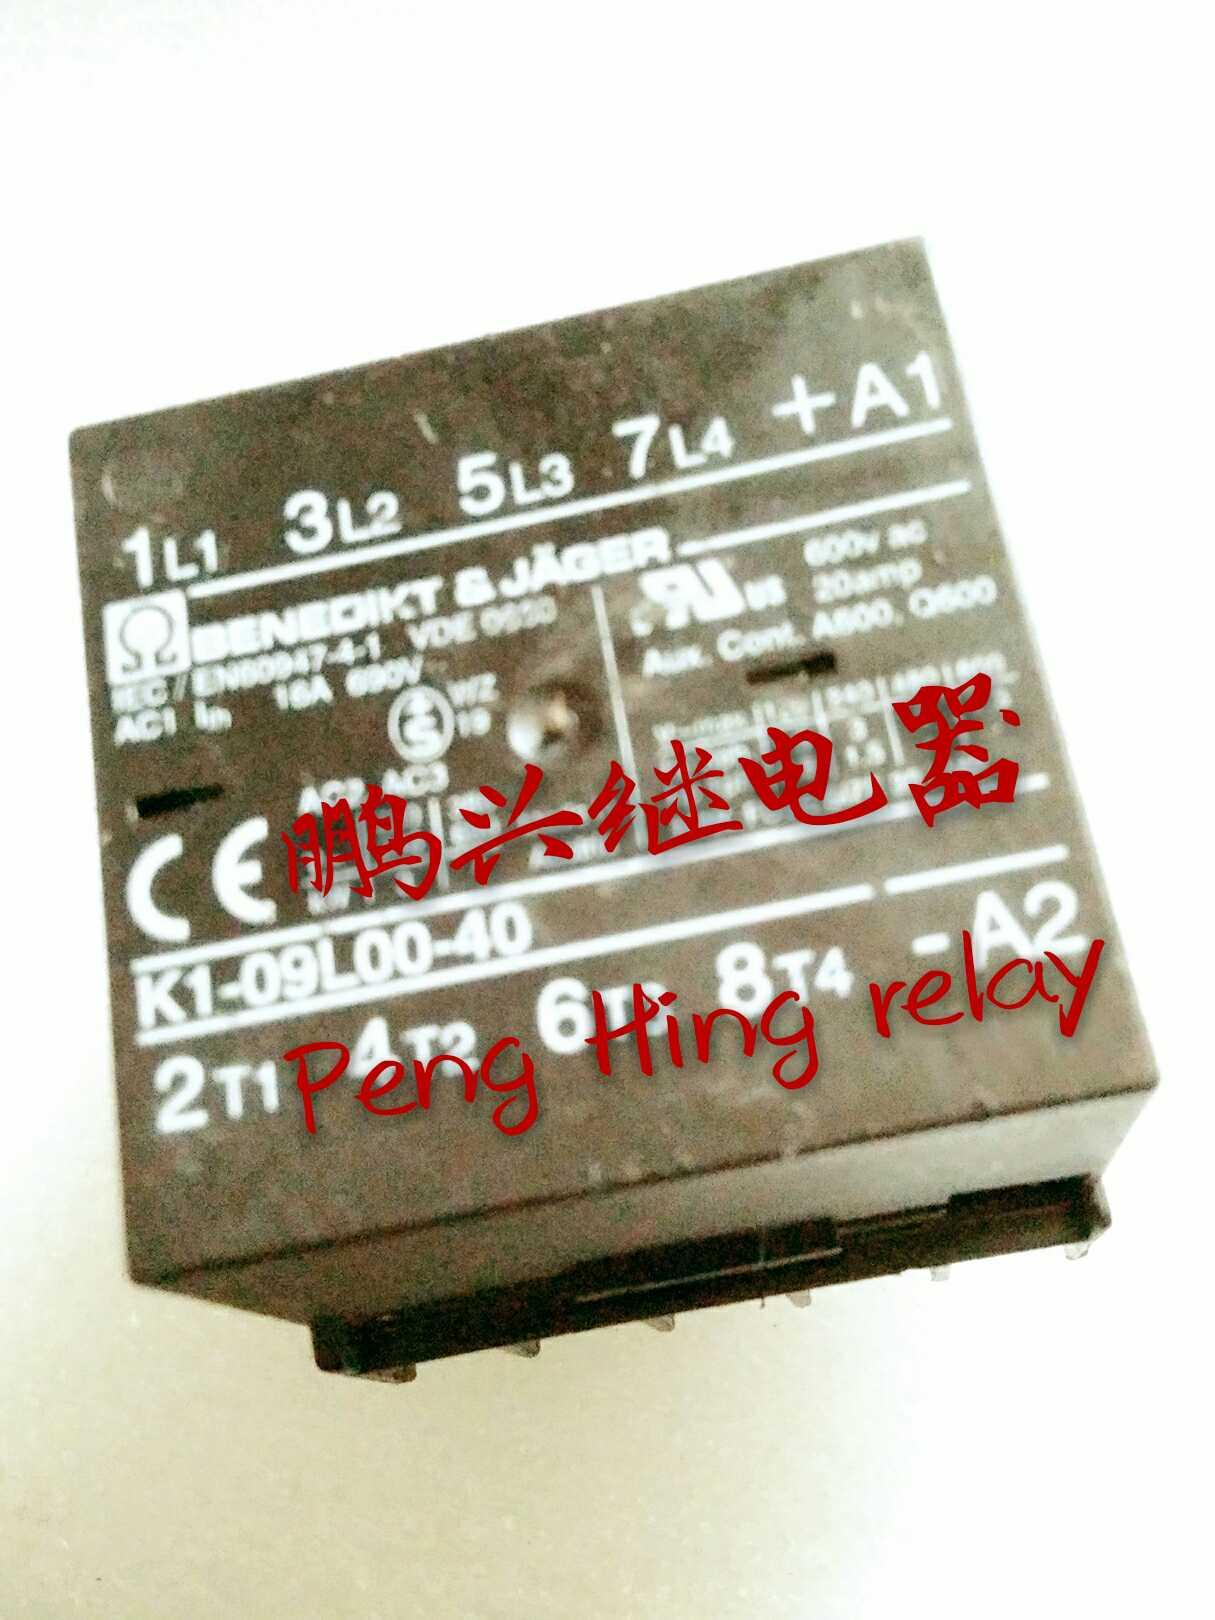 Free Shipping 10 pcs/lot K1-09L00-40 24VDC Contact Electric Relay